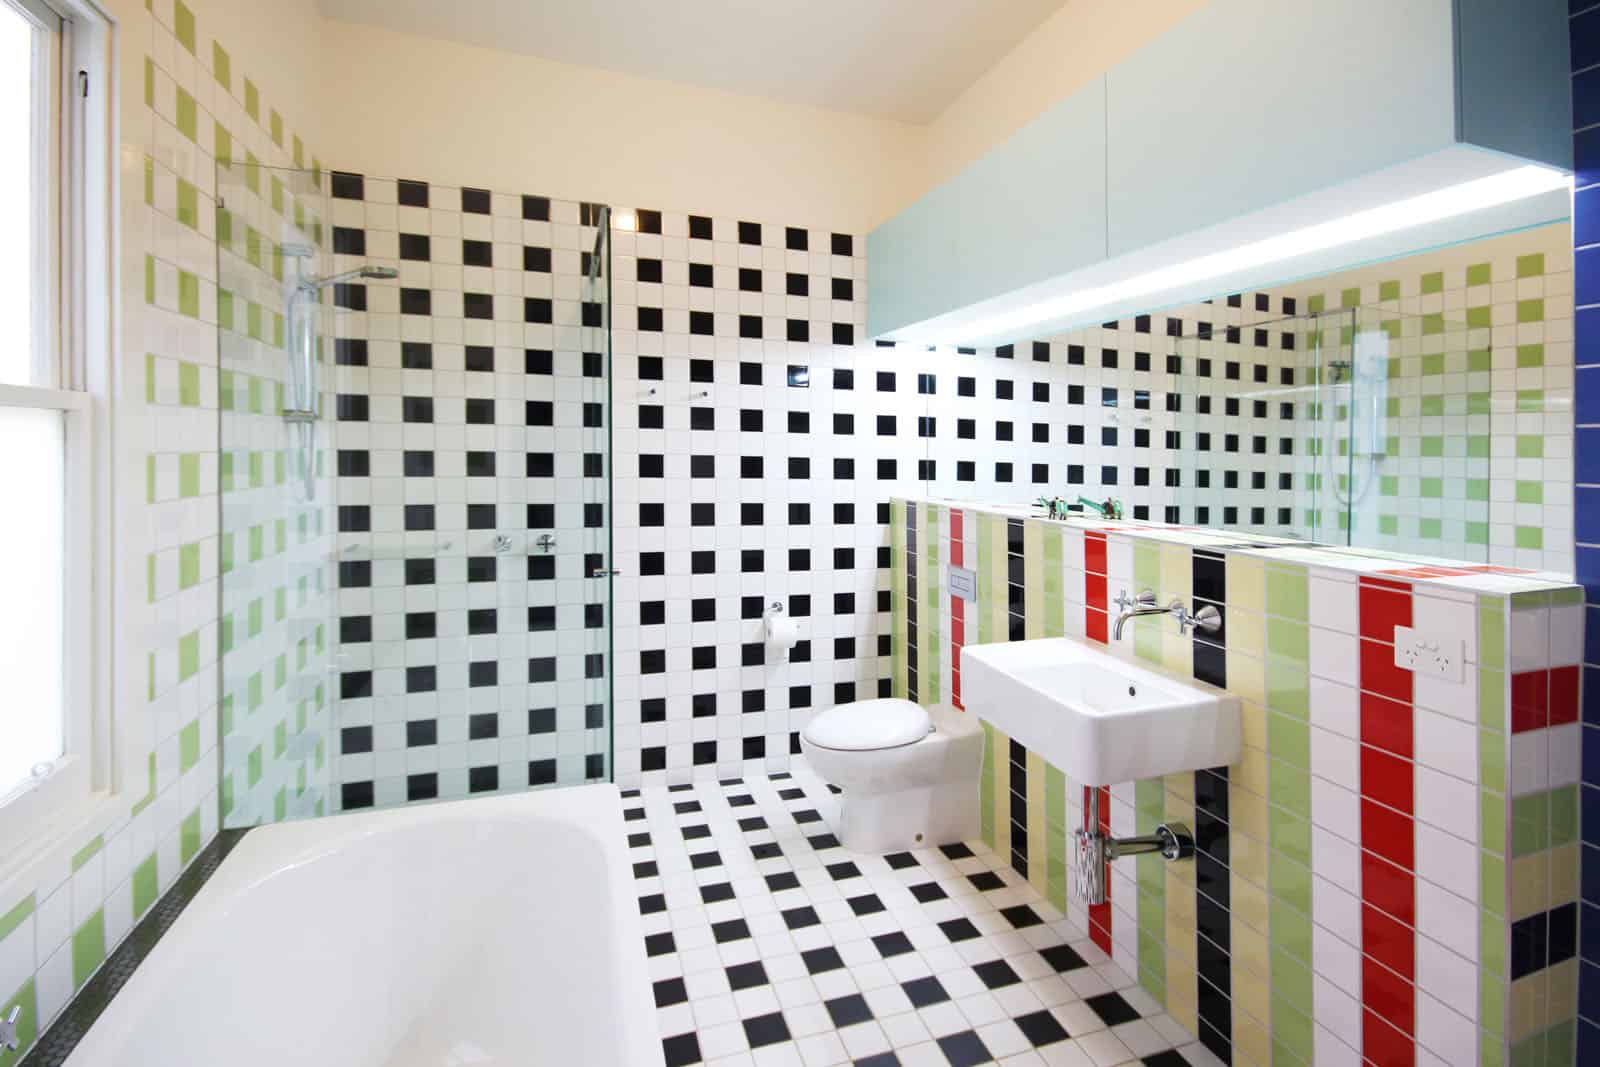 Bathroom Tiles Models johnson bathroom tiles